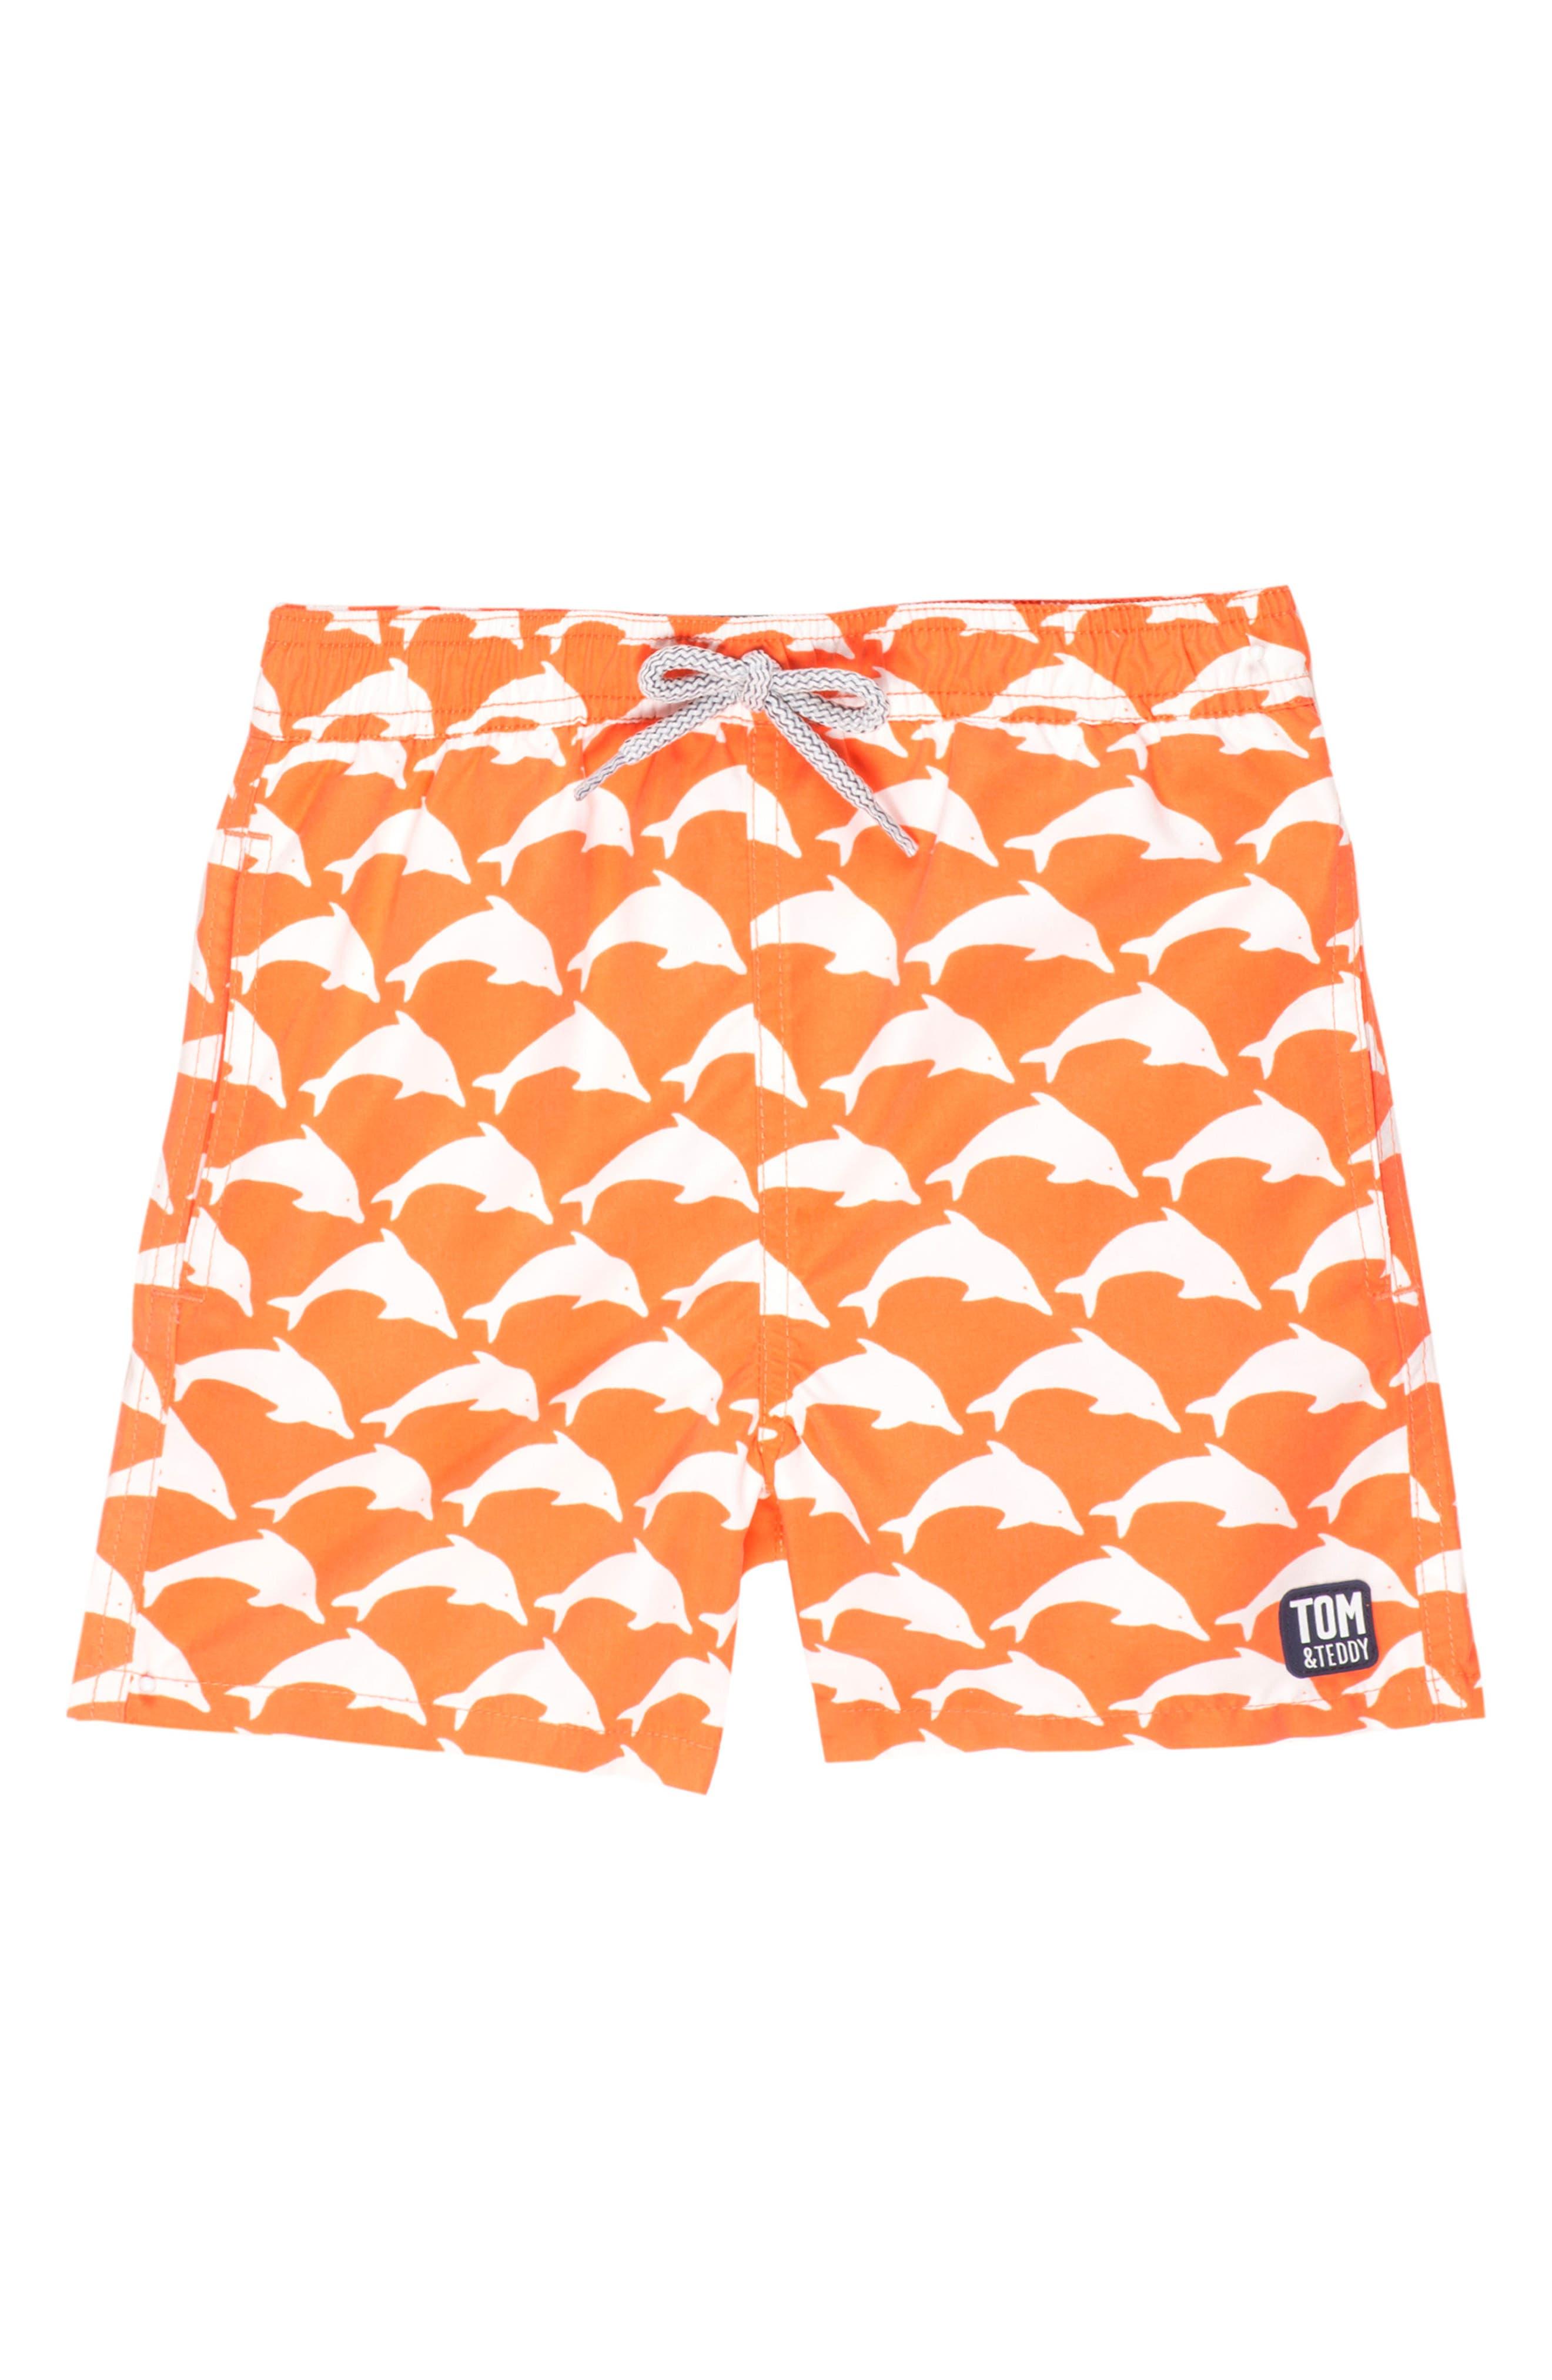 Alternate Image 1 Selected - Tom & Teddy Dolphin Swim Trunks (Toddler Boys, Little Boys & Big Boys)